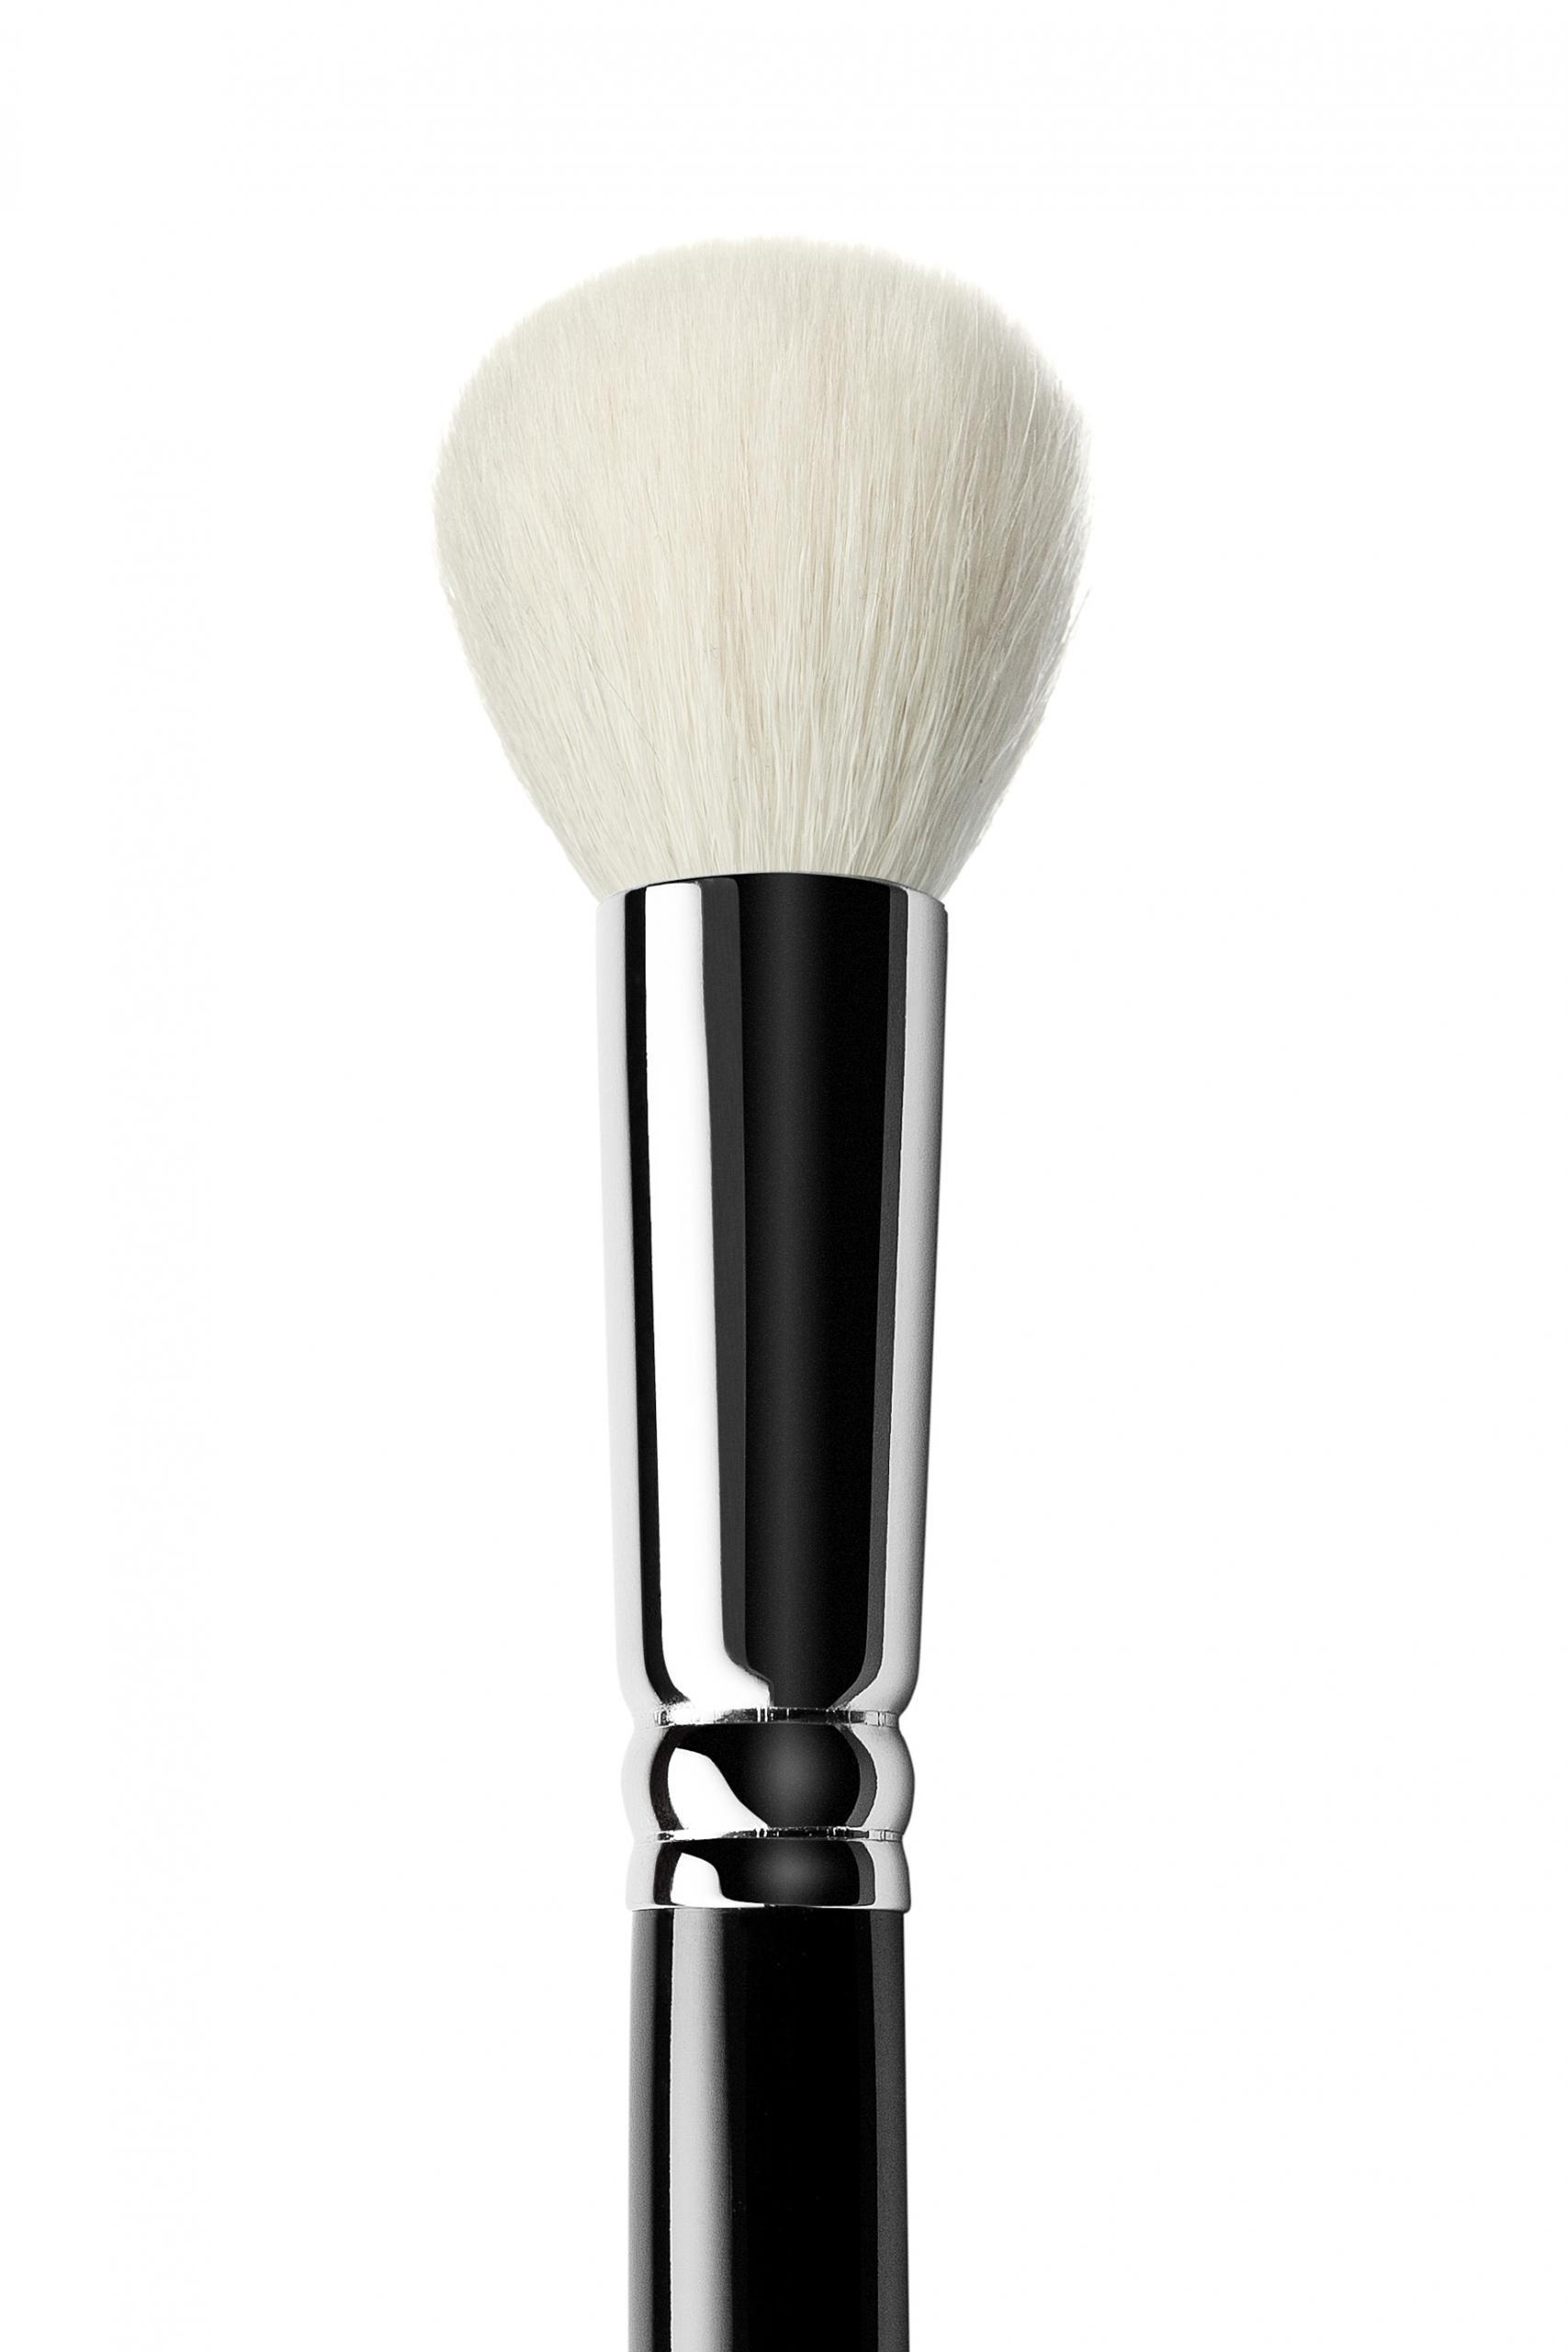 Hair brush for tone Annbeauty A7